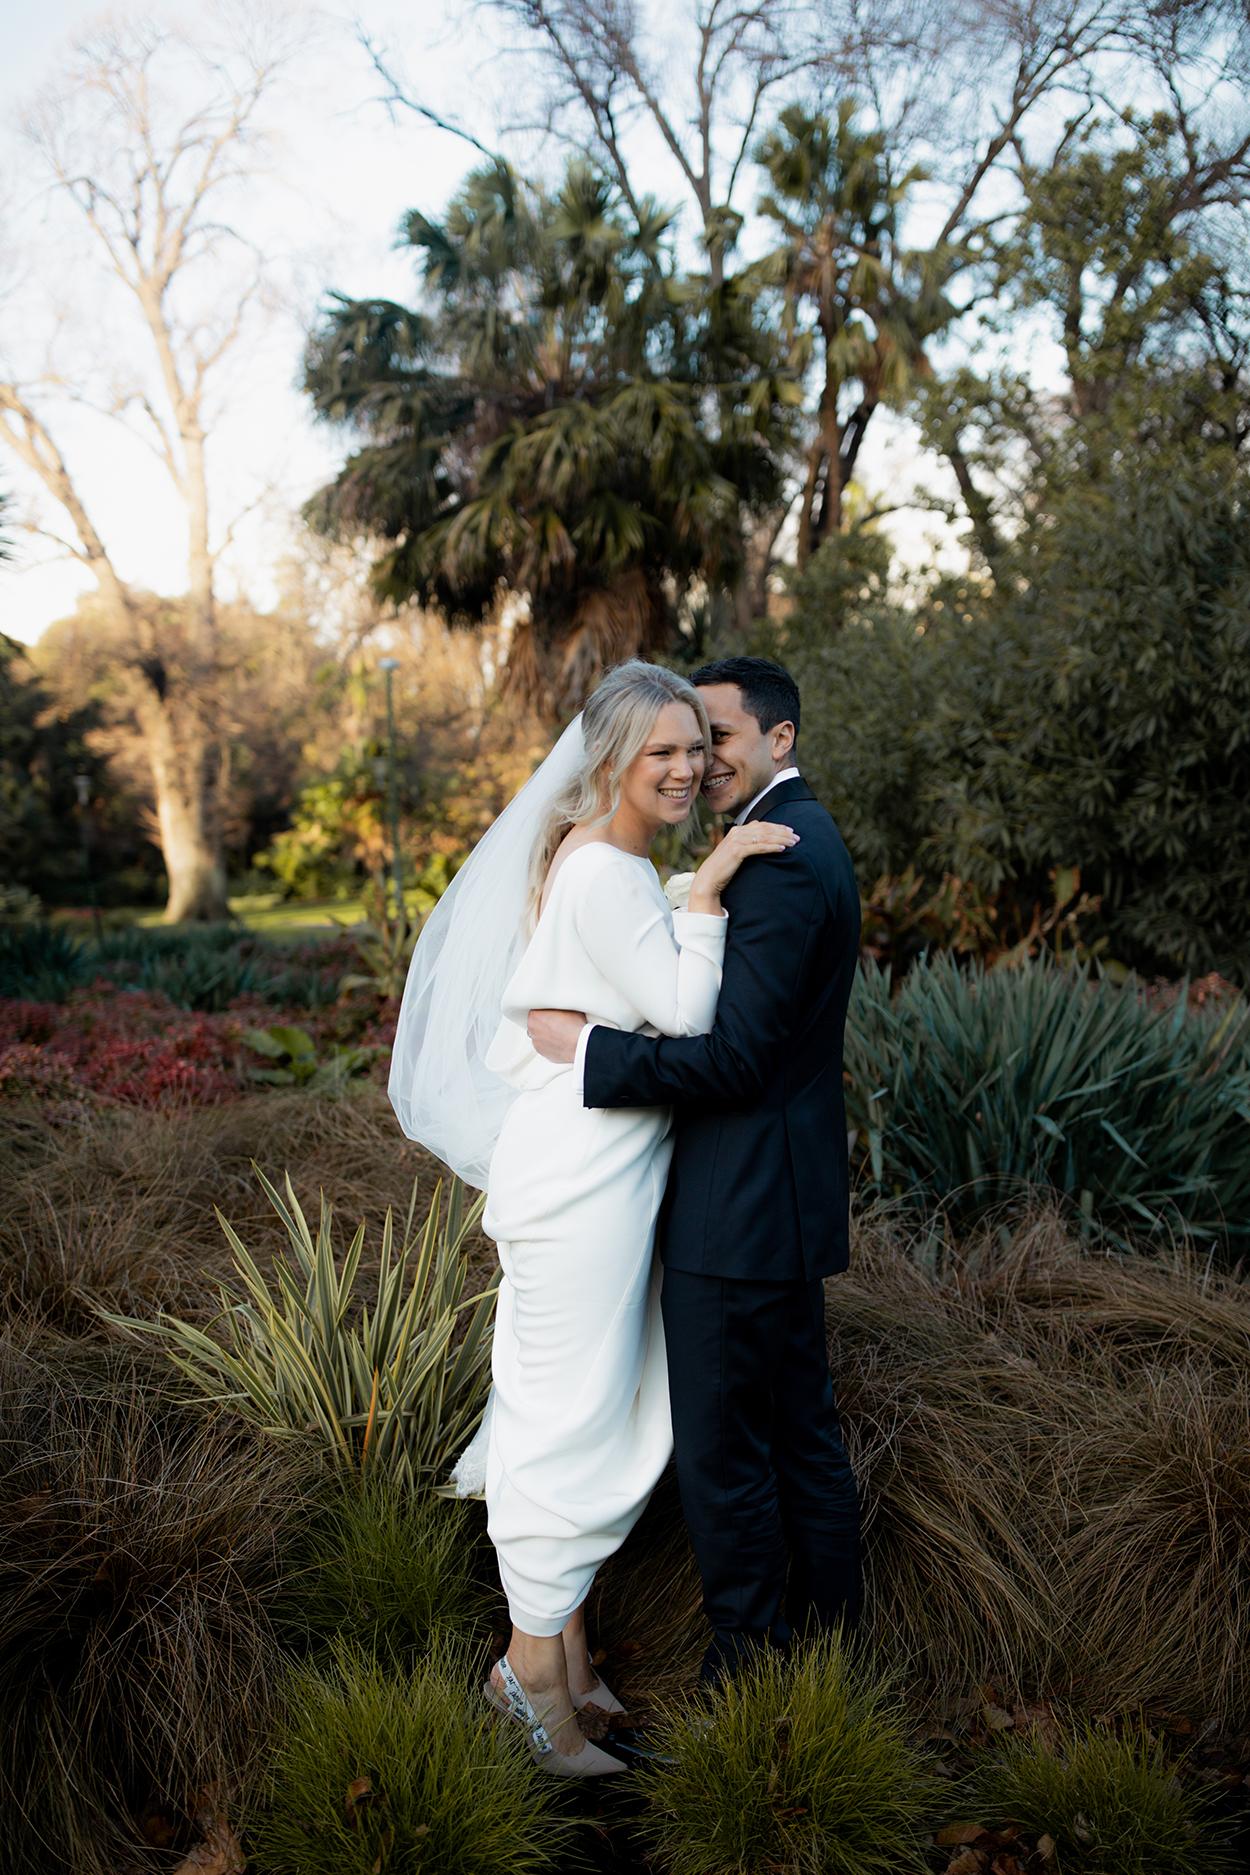 I-Got-You-Babe-Weddings-1.jpg